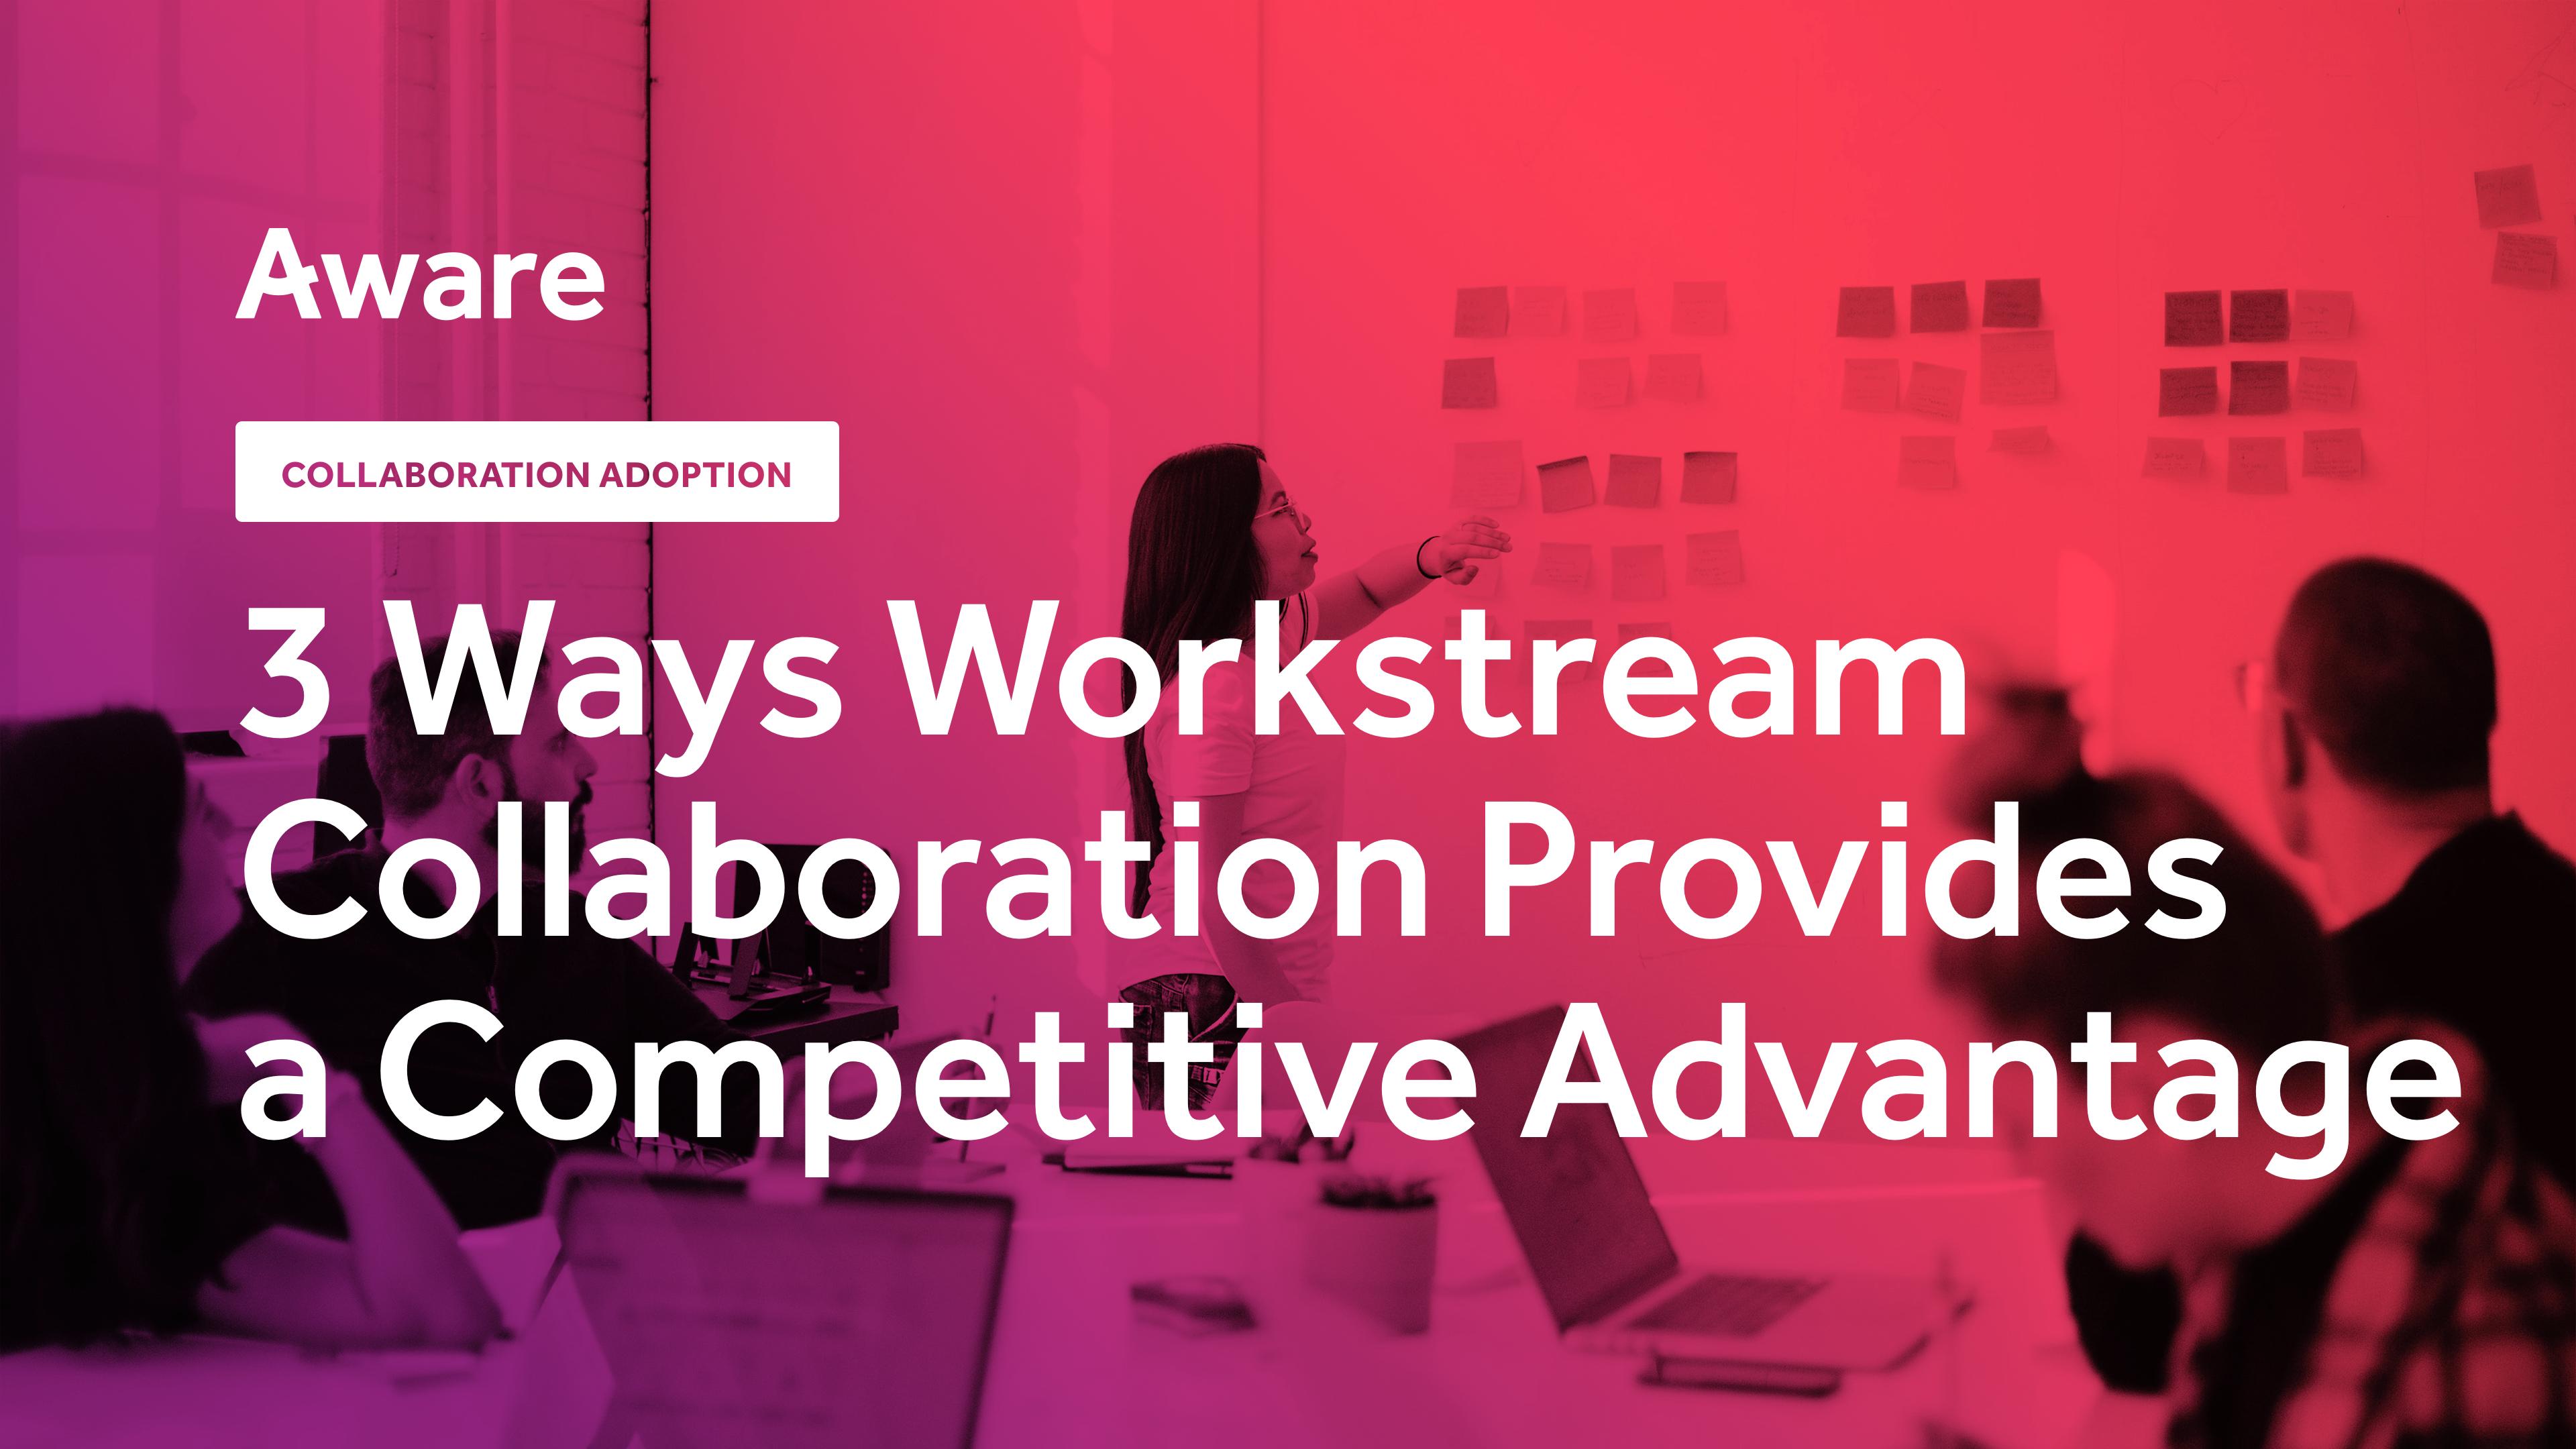 3 Ways Workstream Collaboration Provides a Competitive Advantage